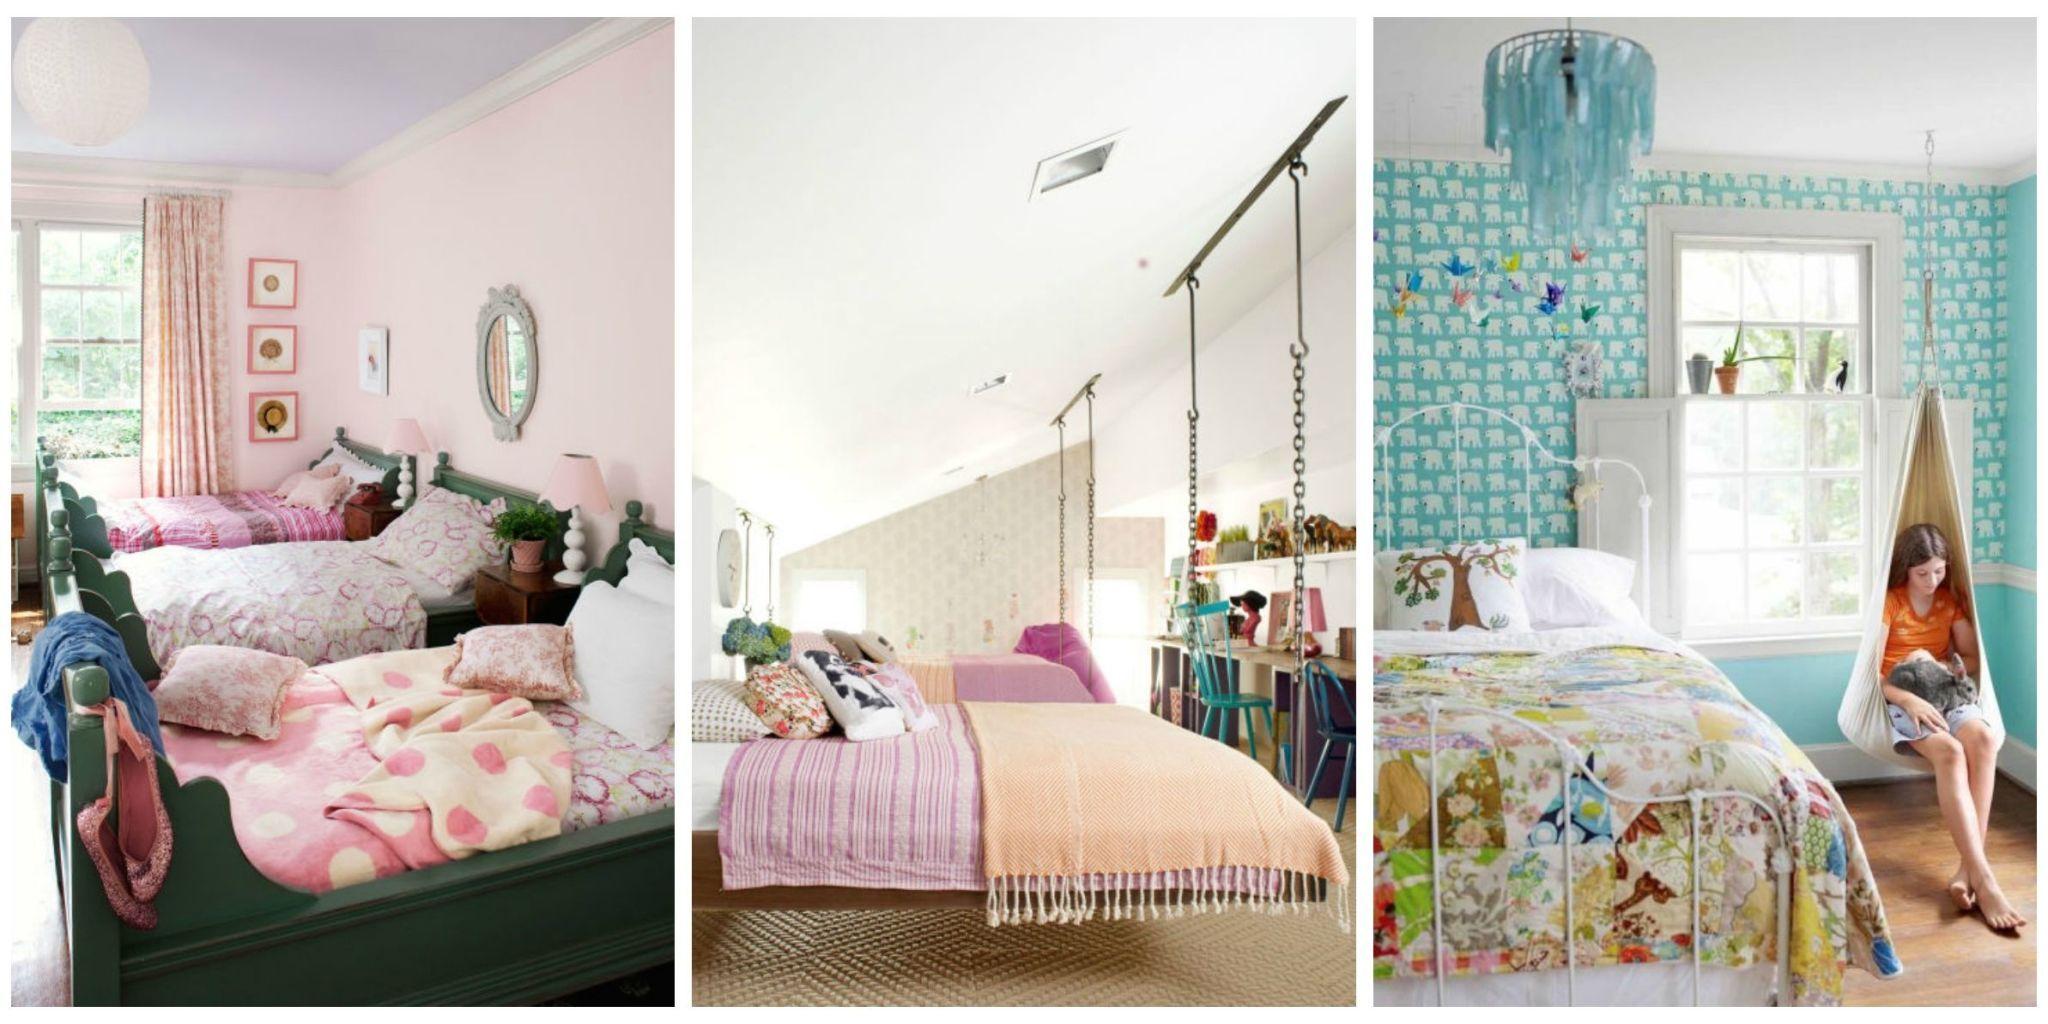 12 Fun Girl's Bedroom Decor Ideas - Cute Room Decorating ... on Room Decor For Girl  id=79437